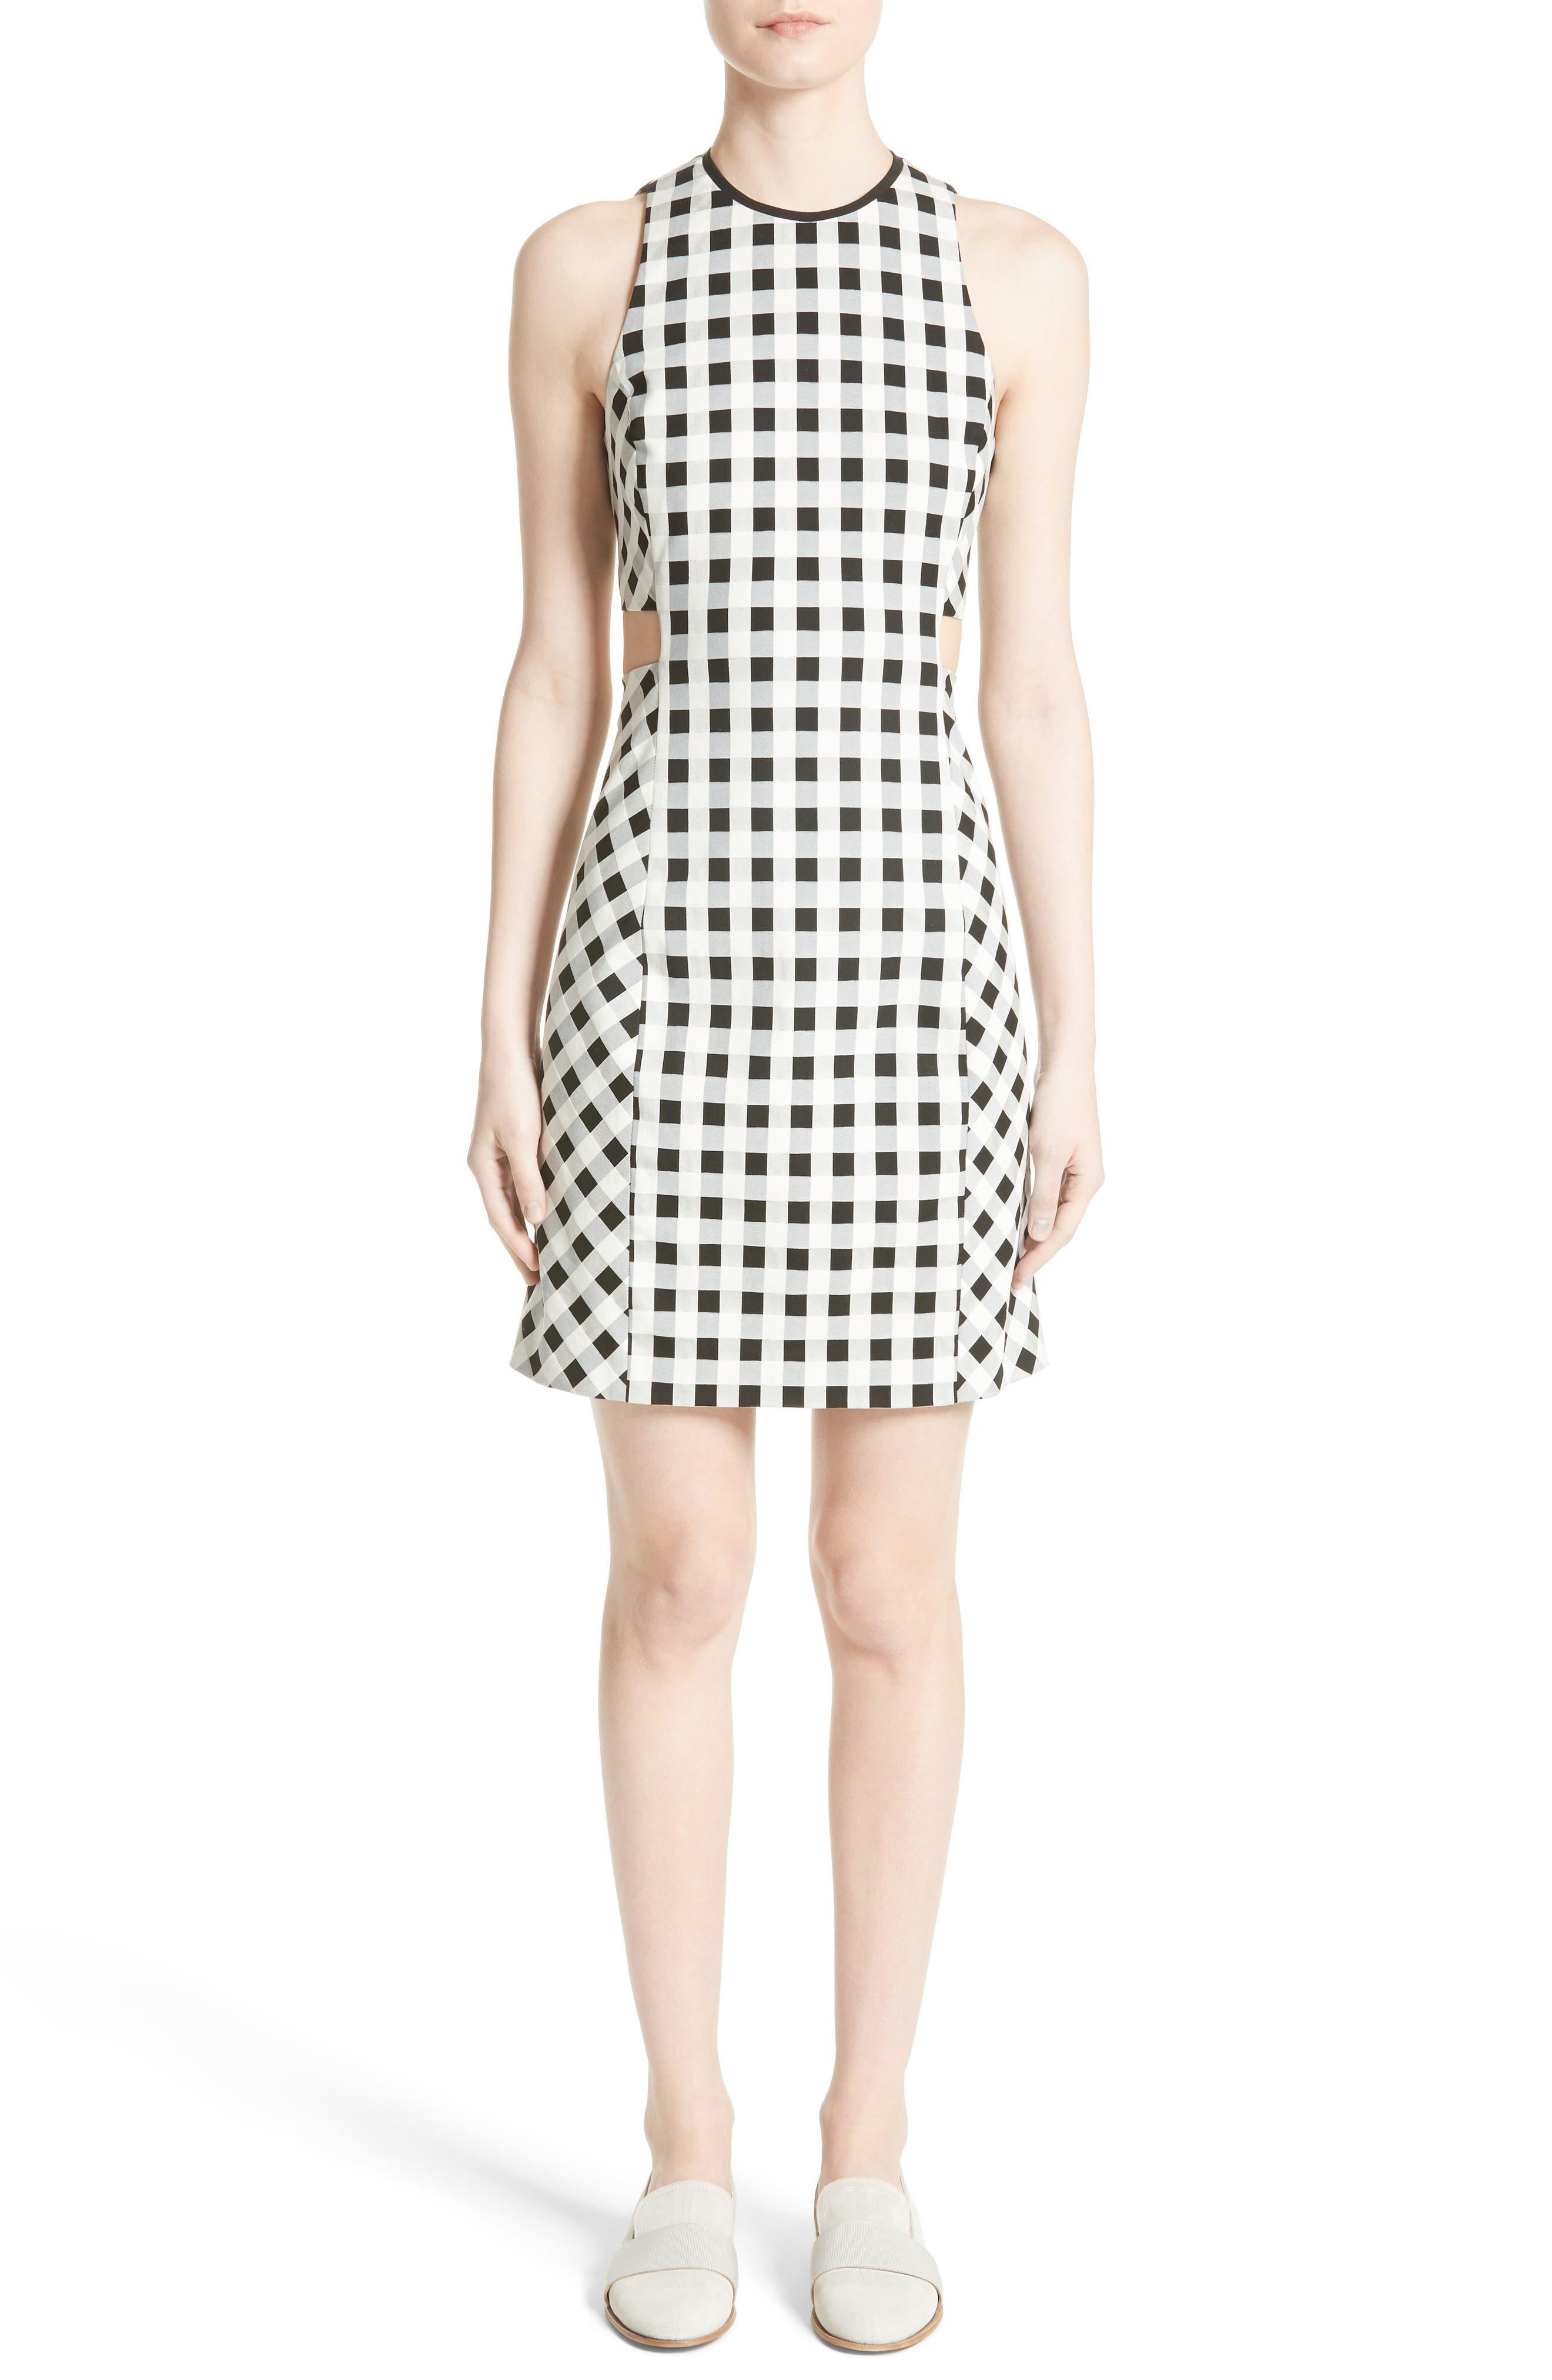 Tahoe Gingham Dress,                             Main thumbnail 1, color,                             Black/ White